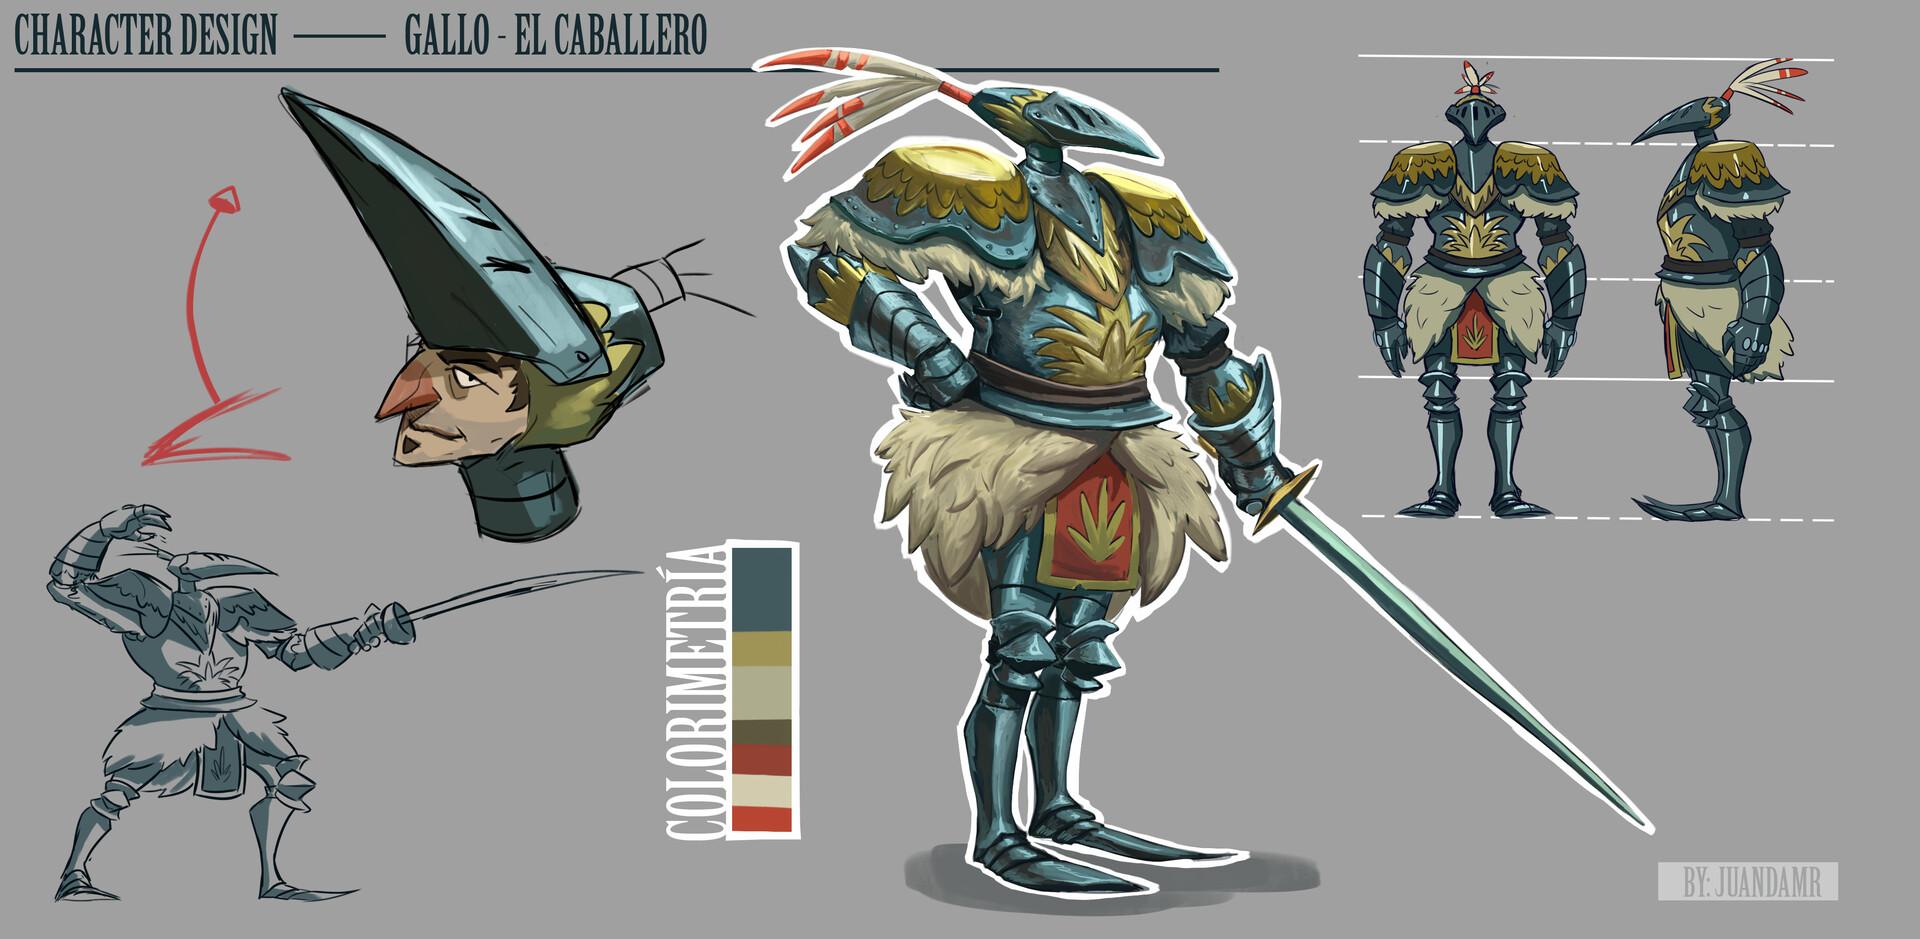 Juanda rico character presentation example